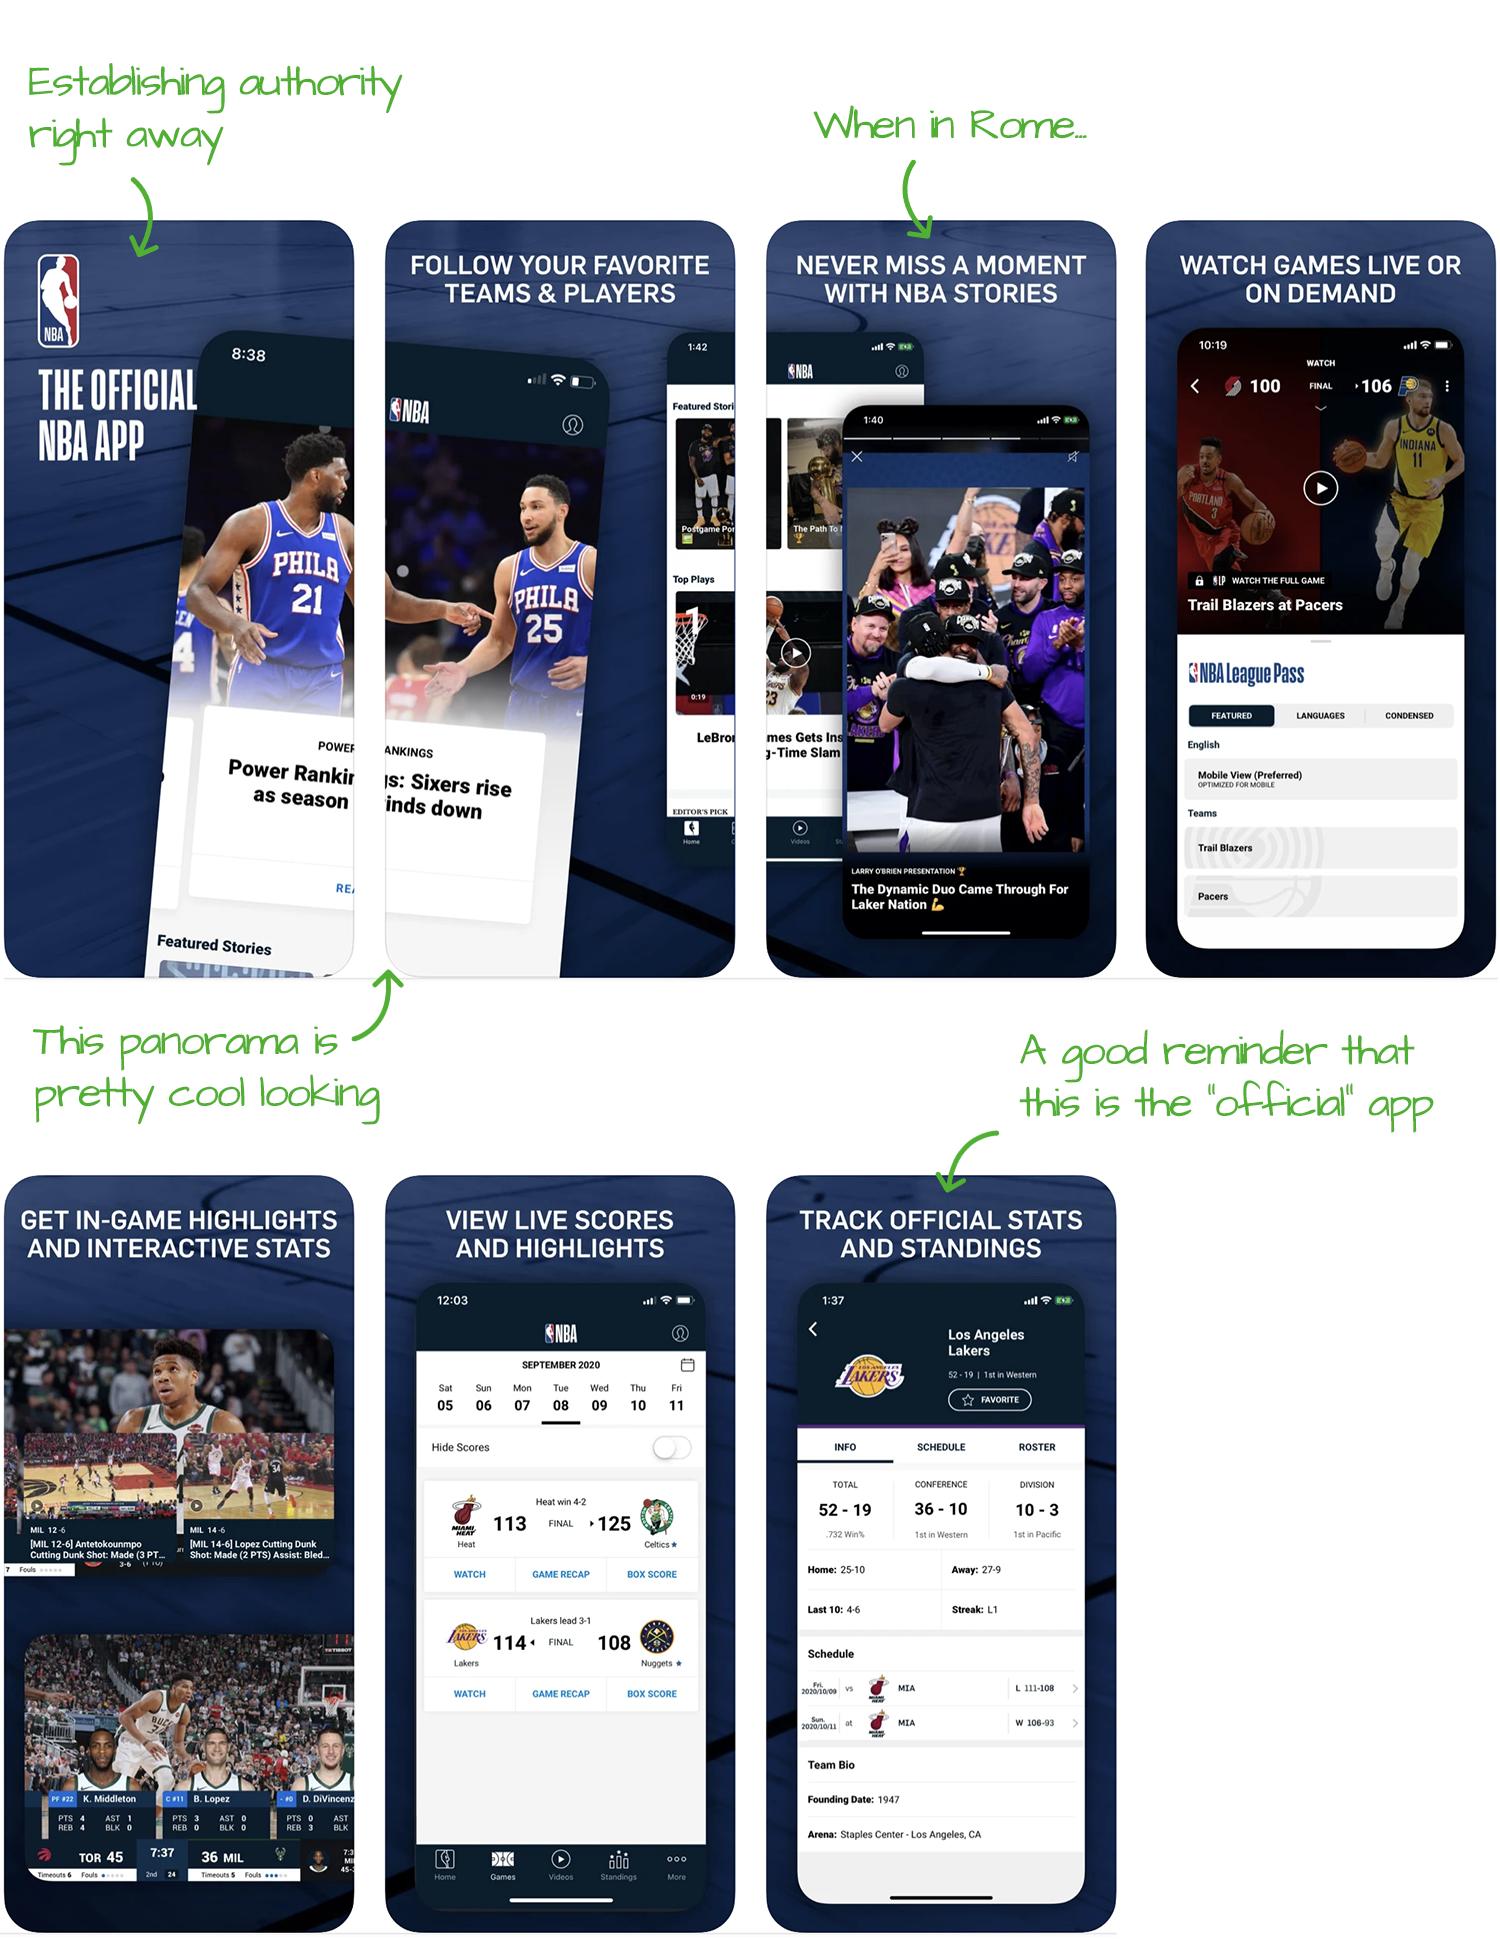 NBA for iOS Screenshot Analysis by Appfigures